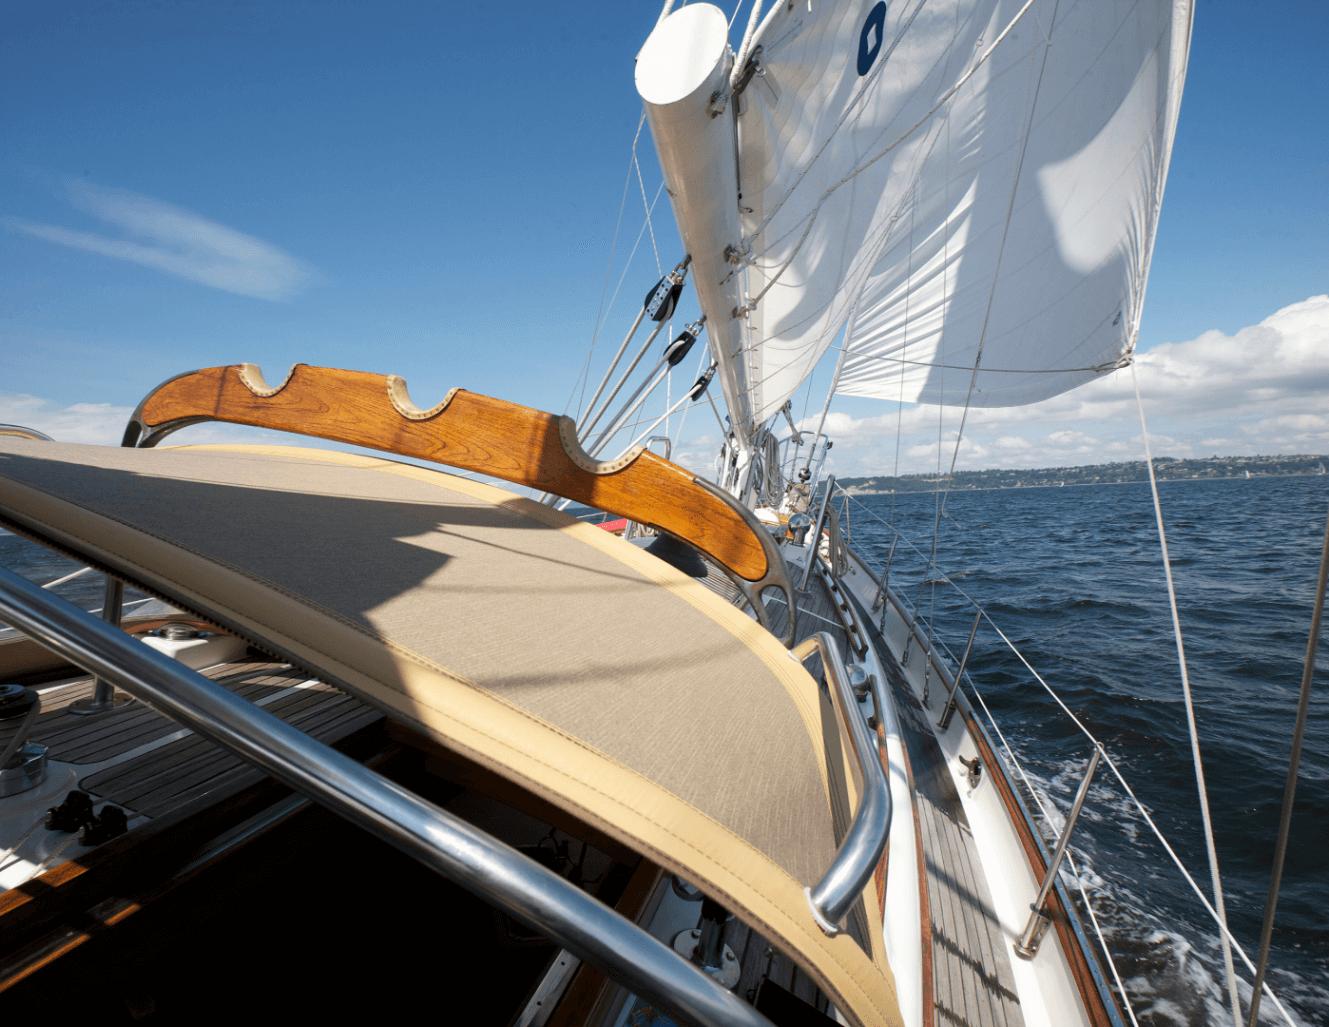 Galatea sailboat on the water showcasing bimini and sailcloth